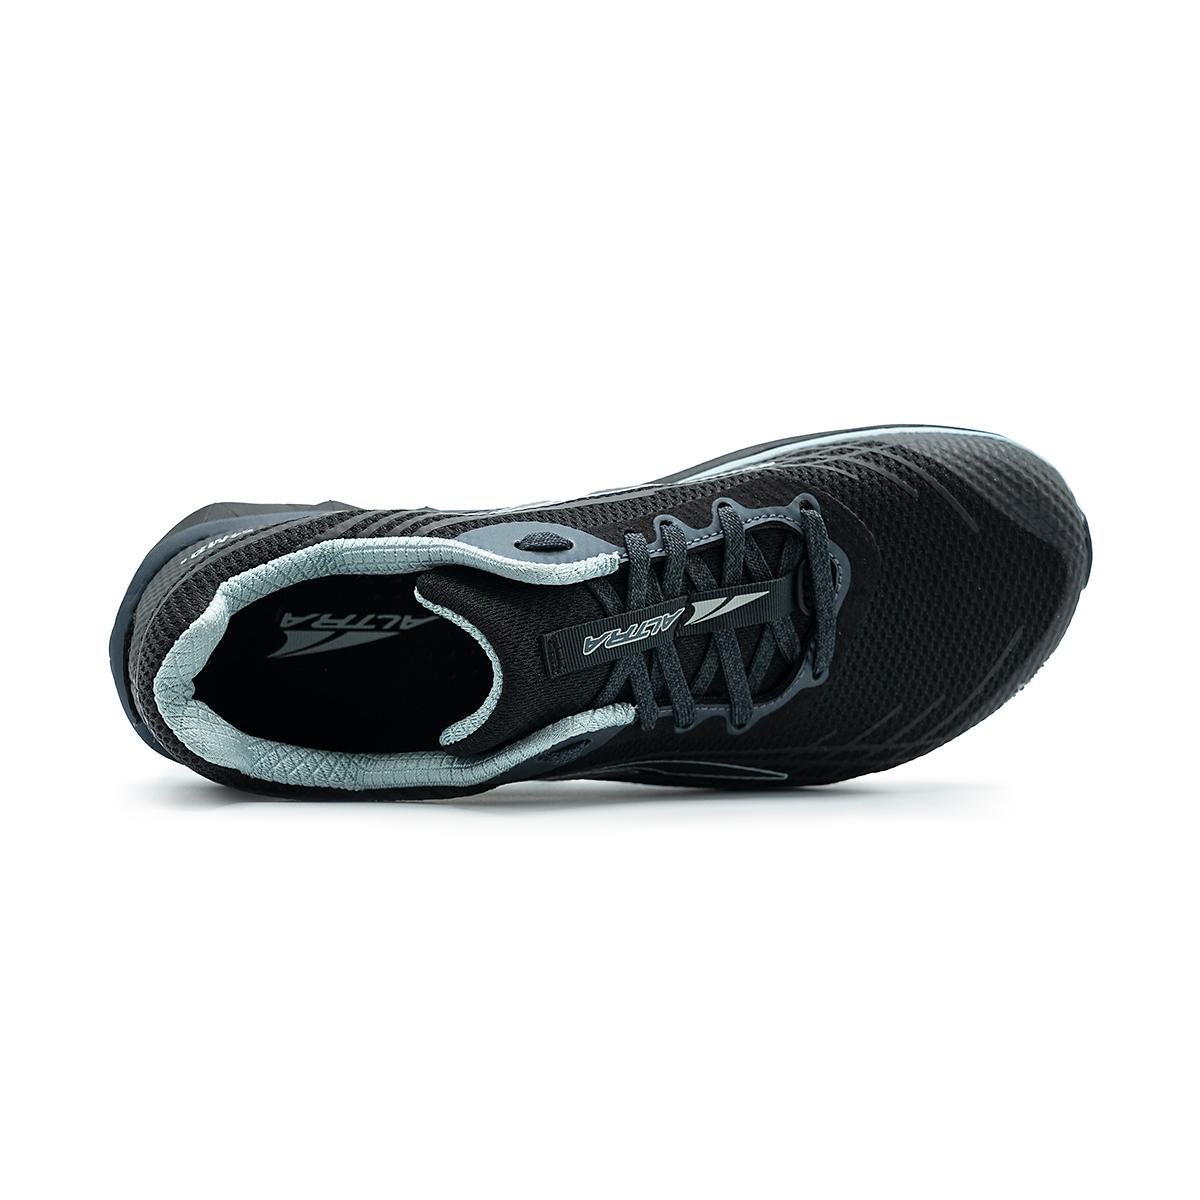 Women's Altra Timp 2 Running Shoe - Color: Black/Gray - Size: 5.5 - Width: Regular, Black/Gray, large, image 3